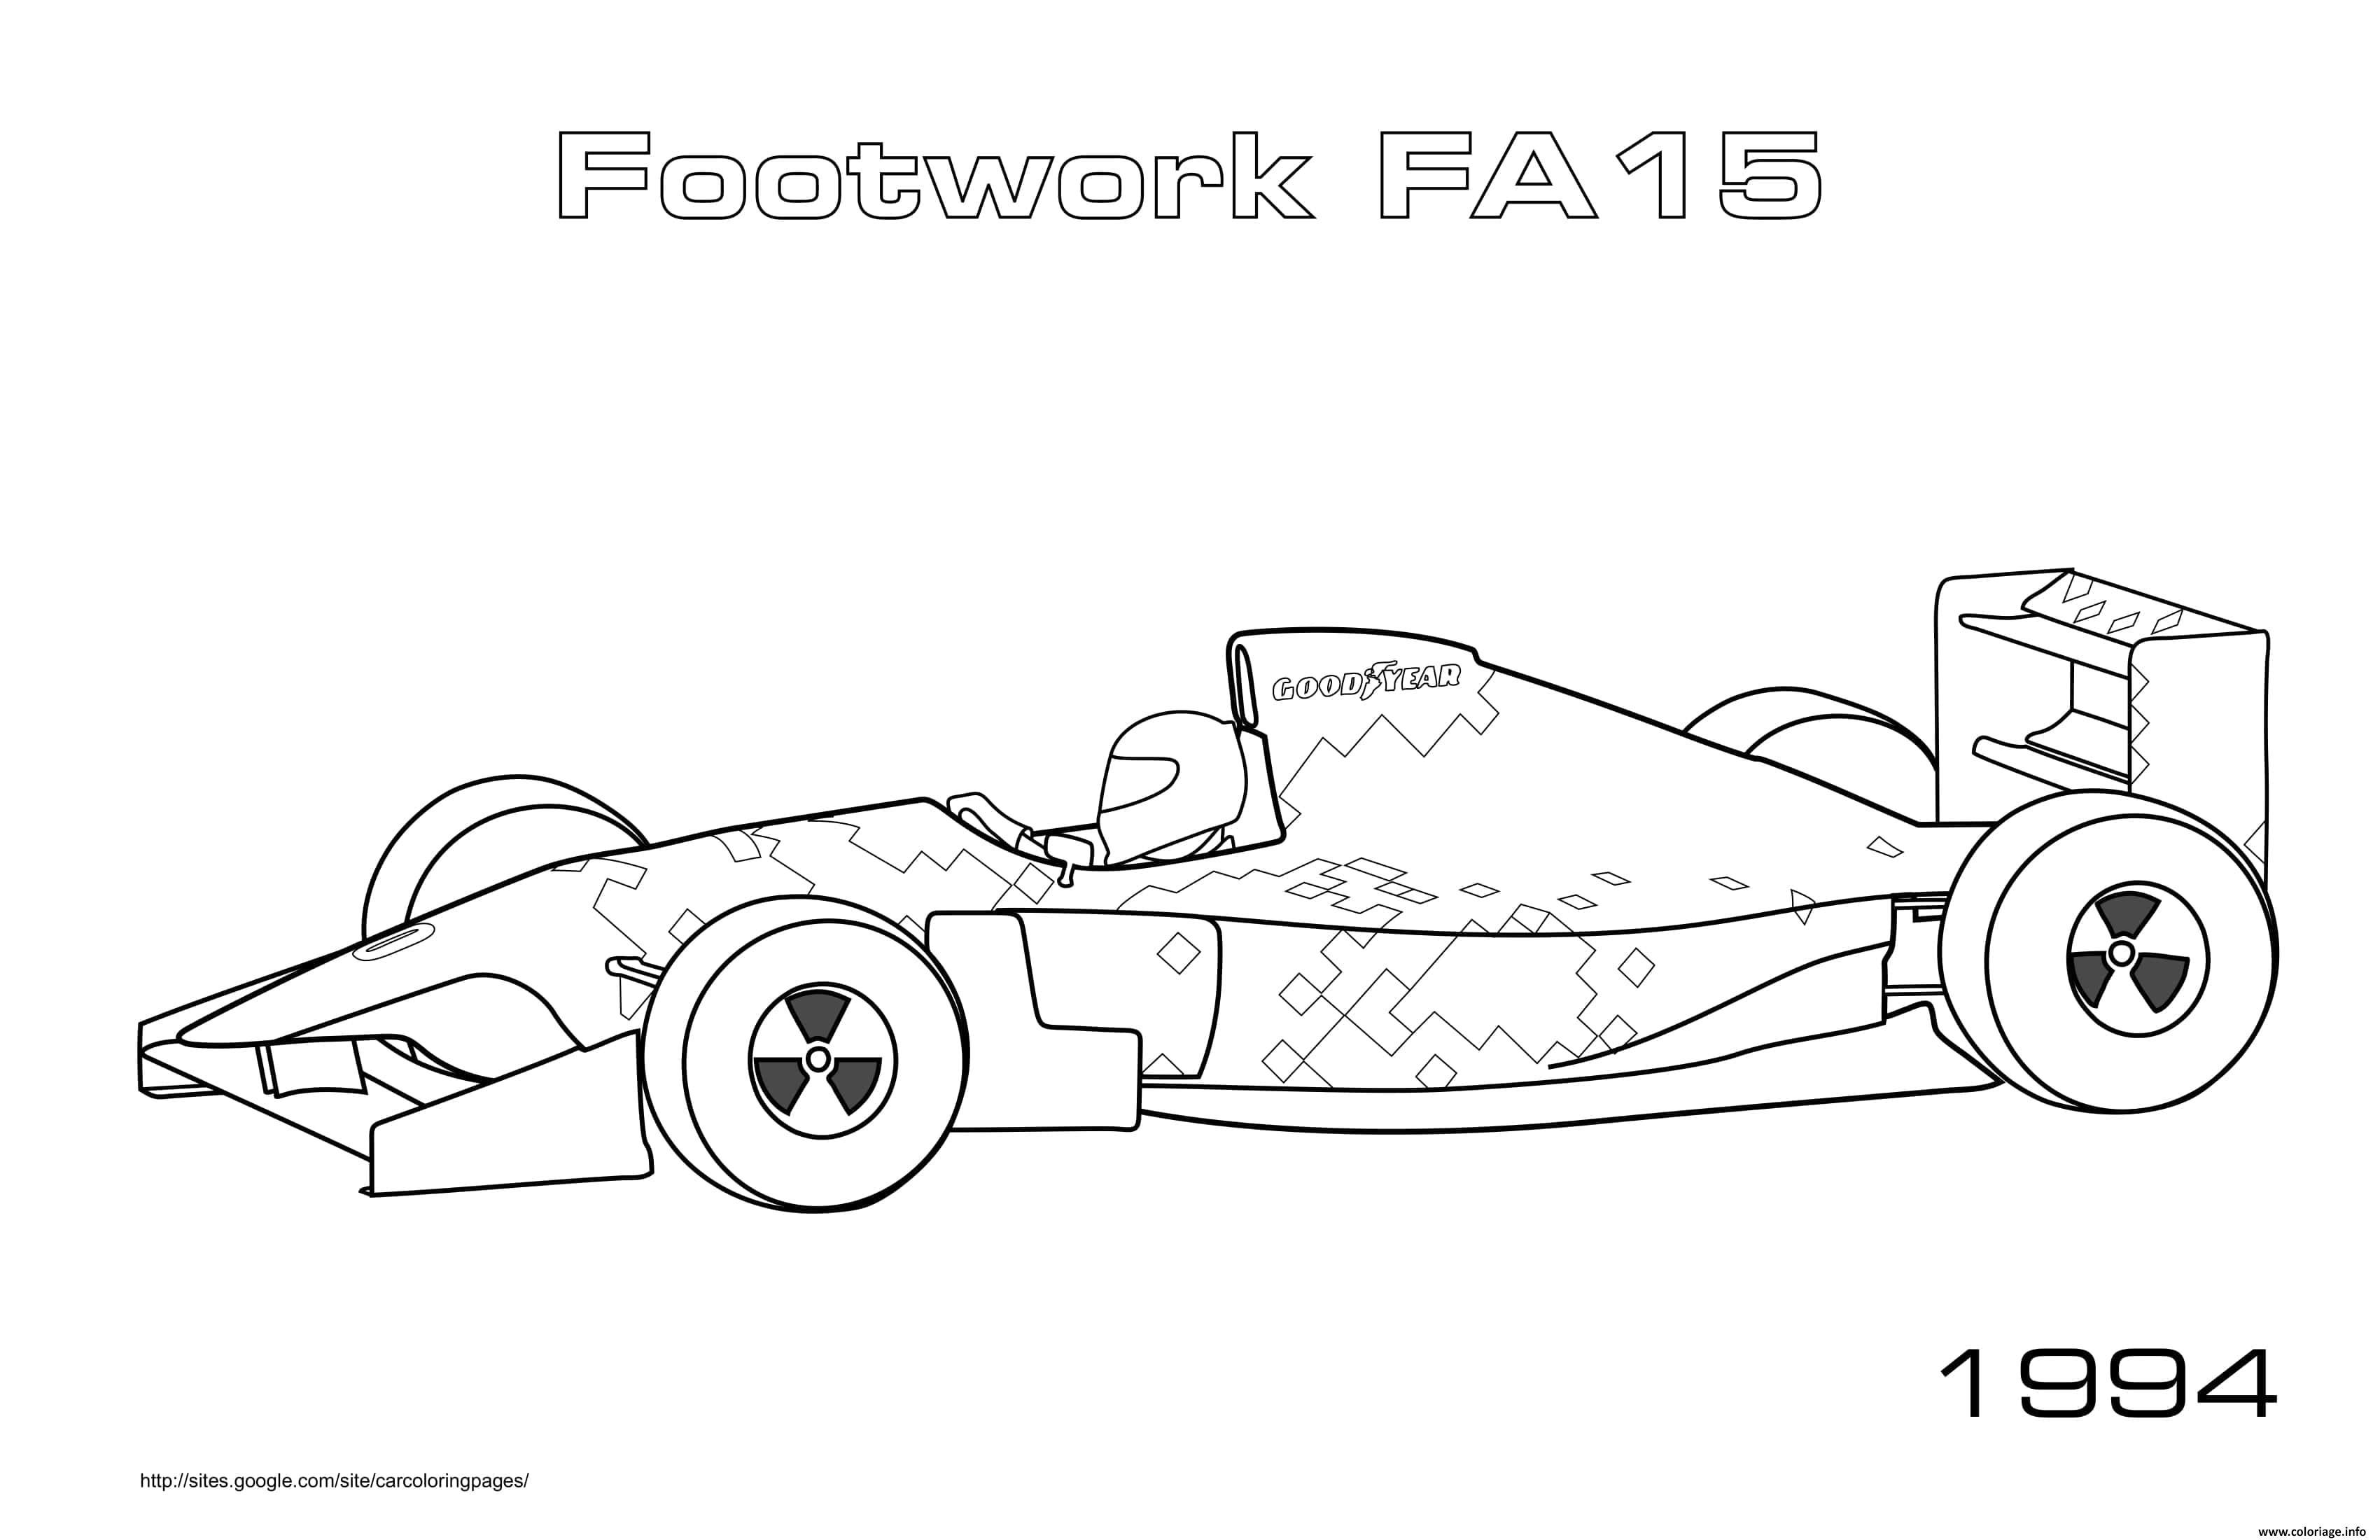 Dessin Formule 1 Footwork Fa15 1994 Coloriage Gratuit à Imprimer